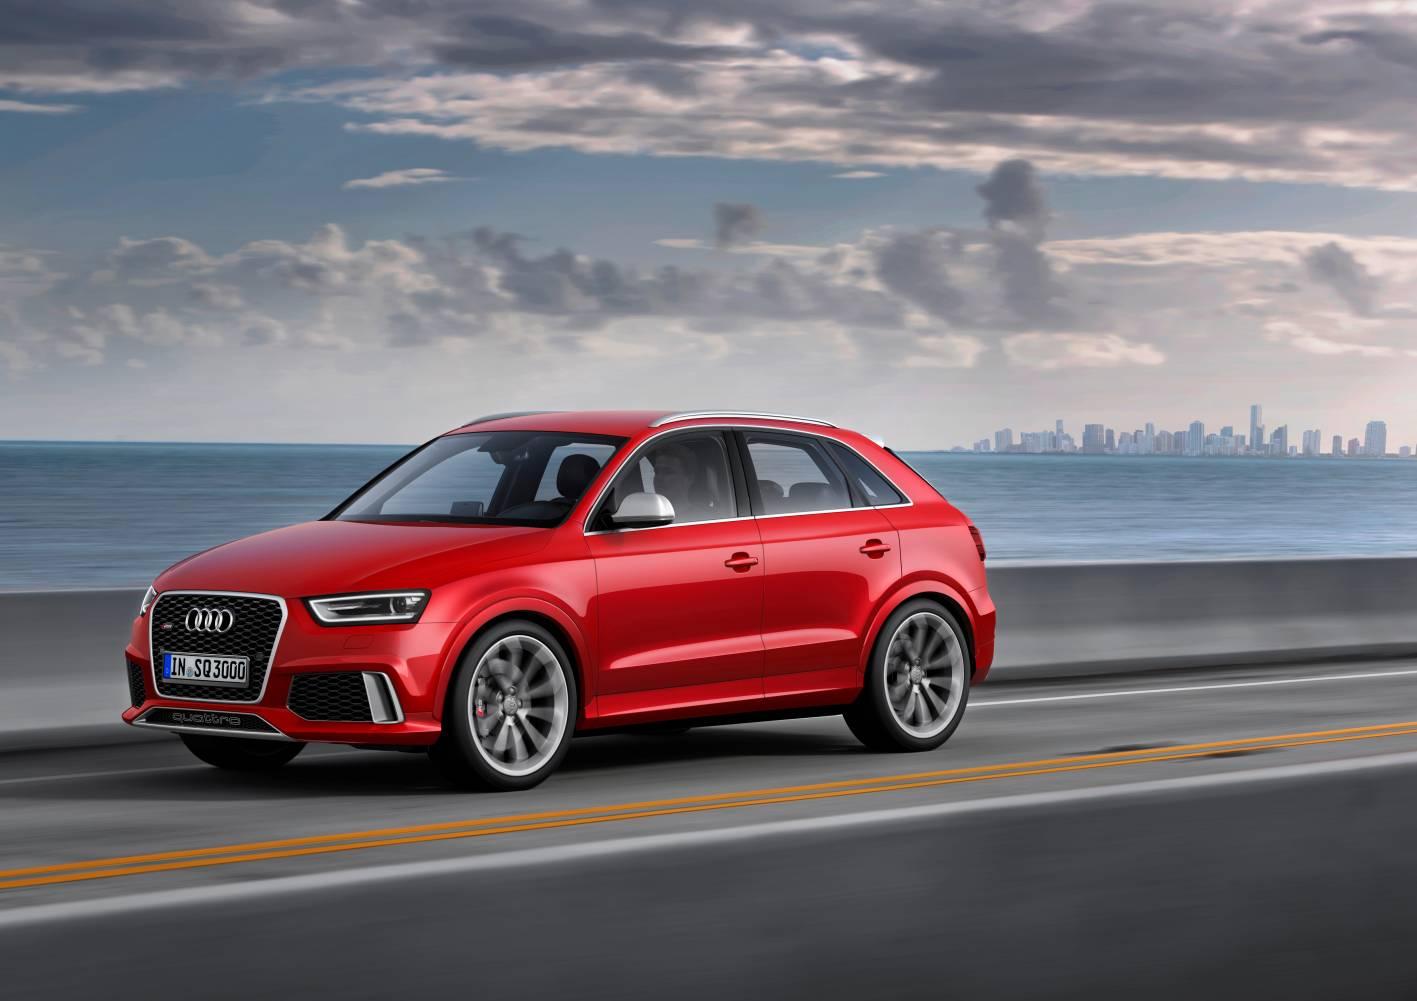 Audi Cars News Audi Rs Q3 Arriving In Feb 2014